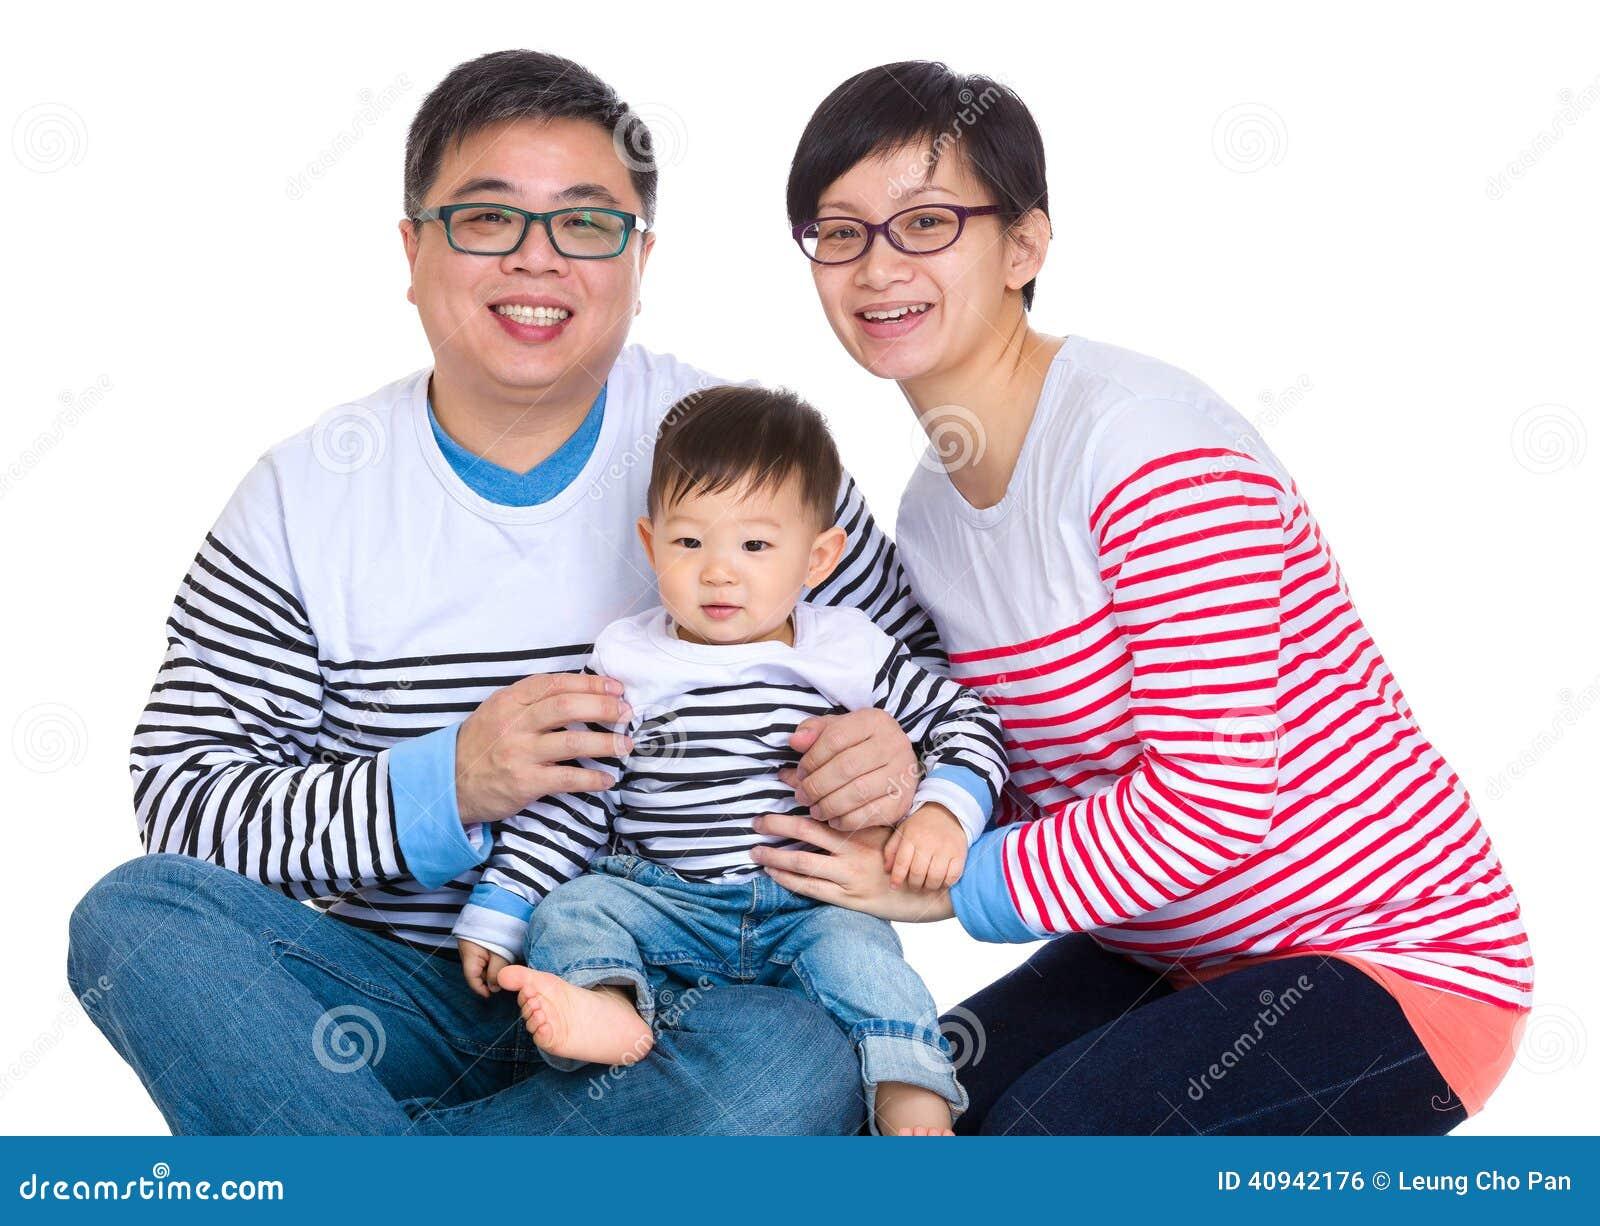 Brunette Couple 4 Manhattan Couple White Asian Only